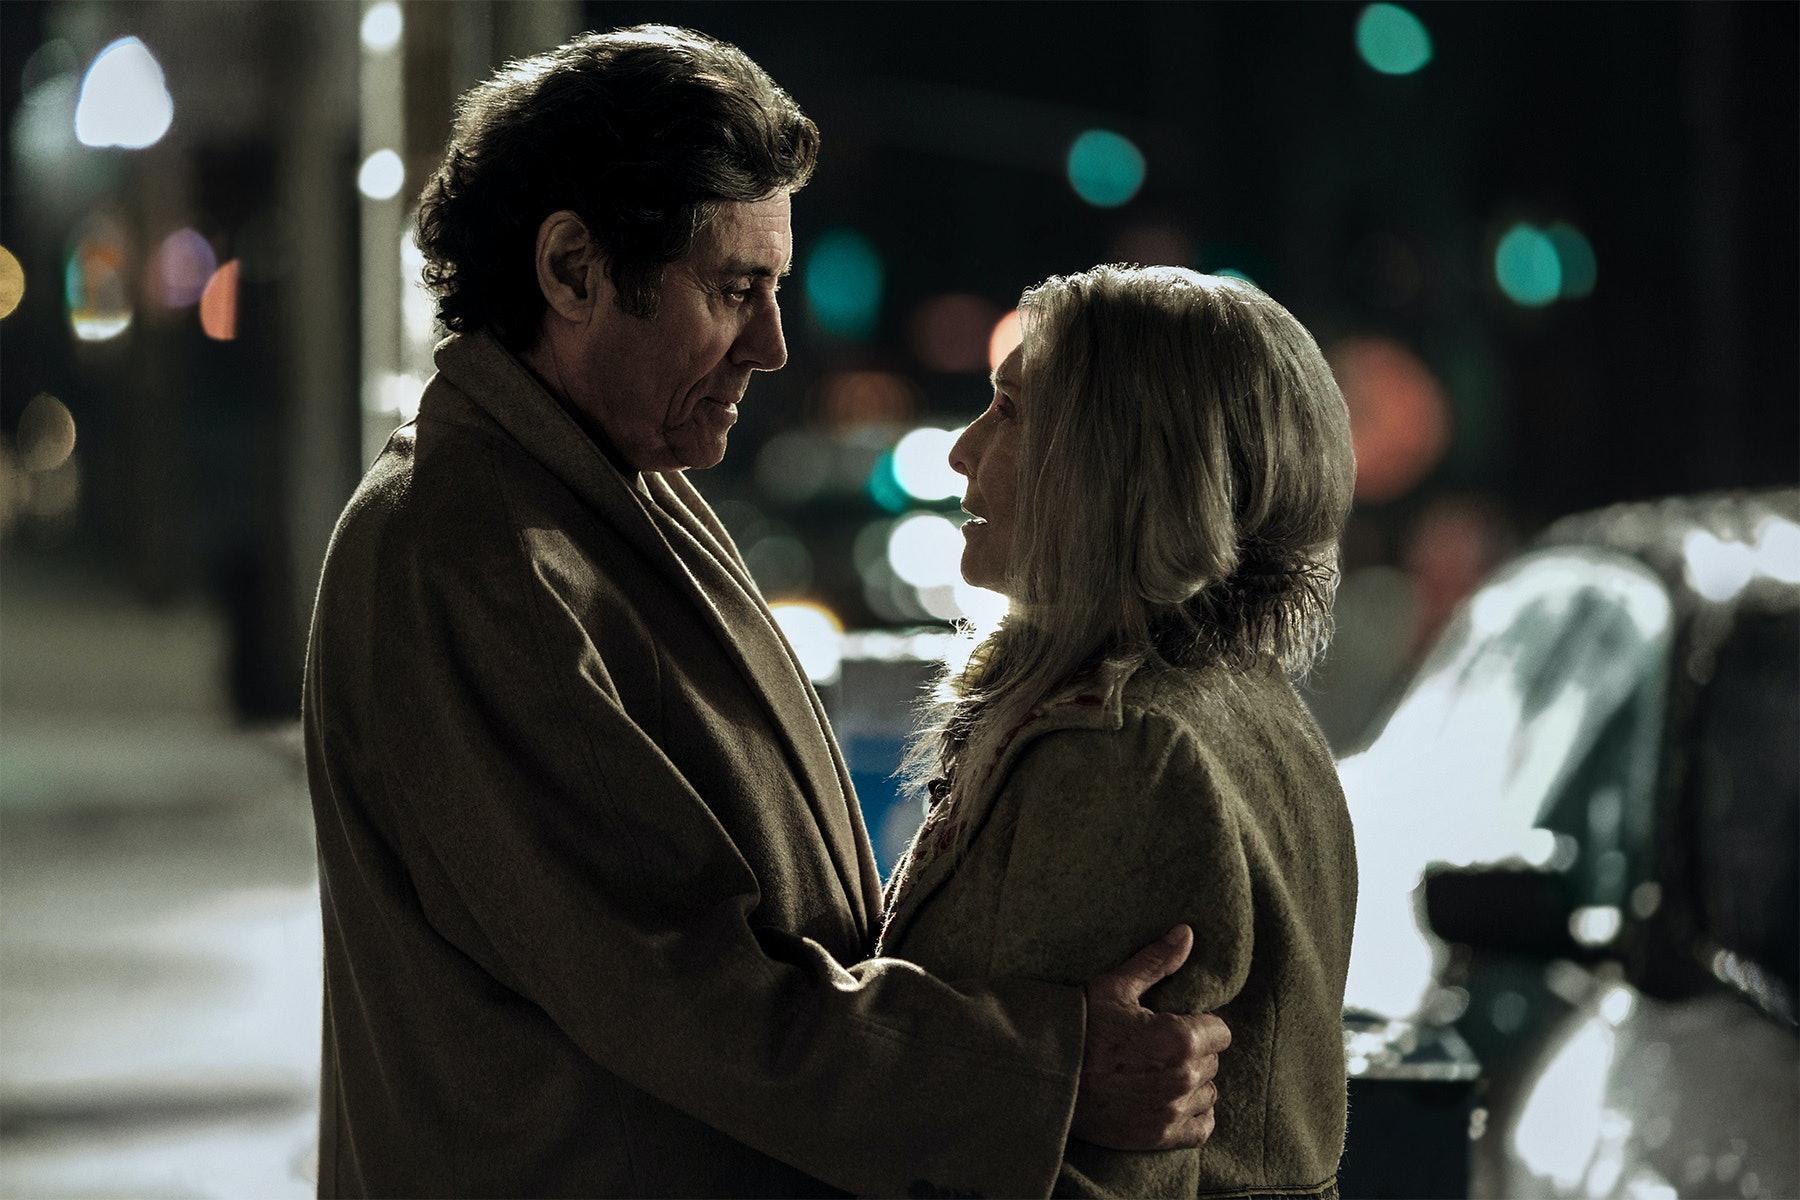 Ian McShane and Cloris Leachman in 'American Gods'